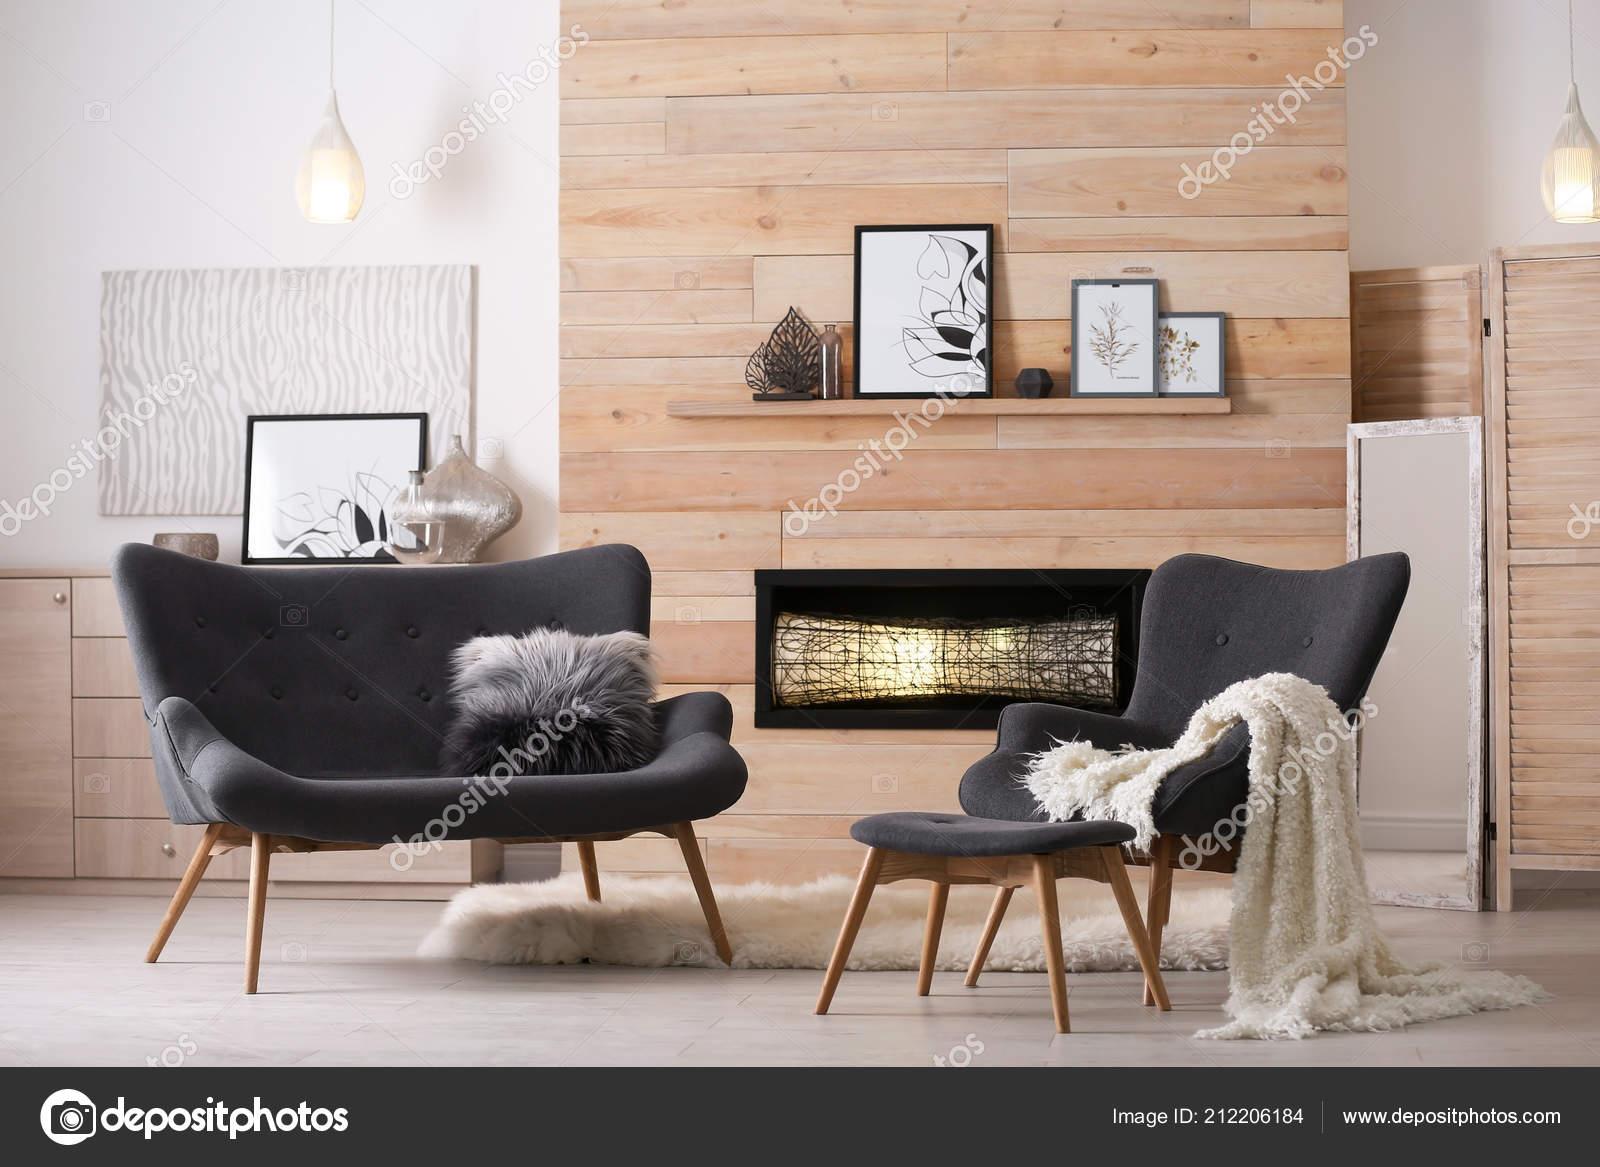 Cozy Living Room Interior Comfortable Furniture Decorative ...